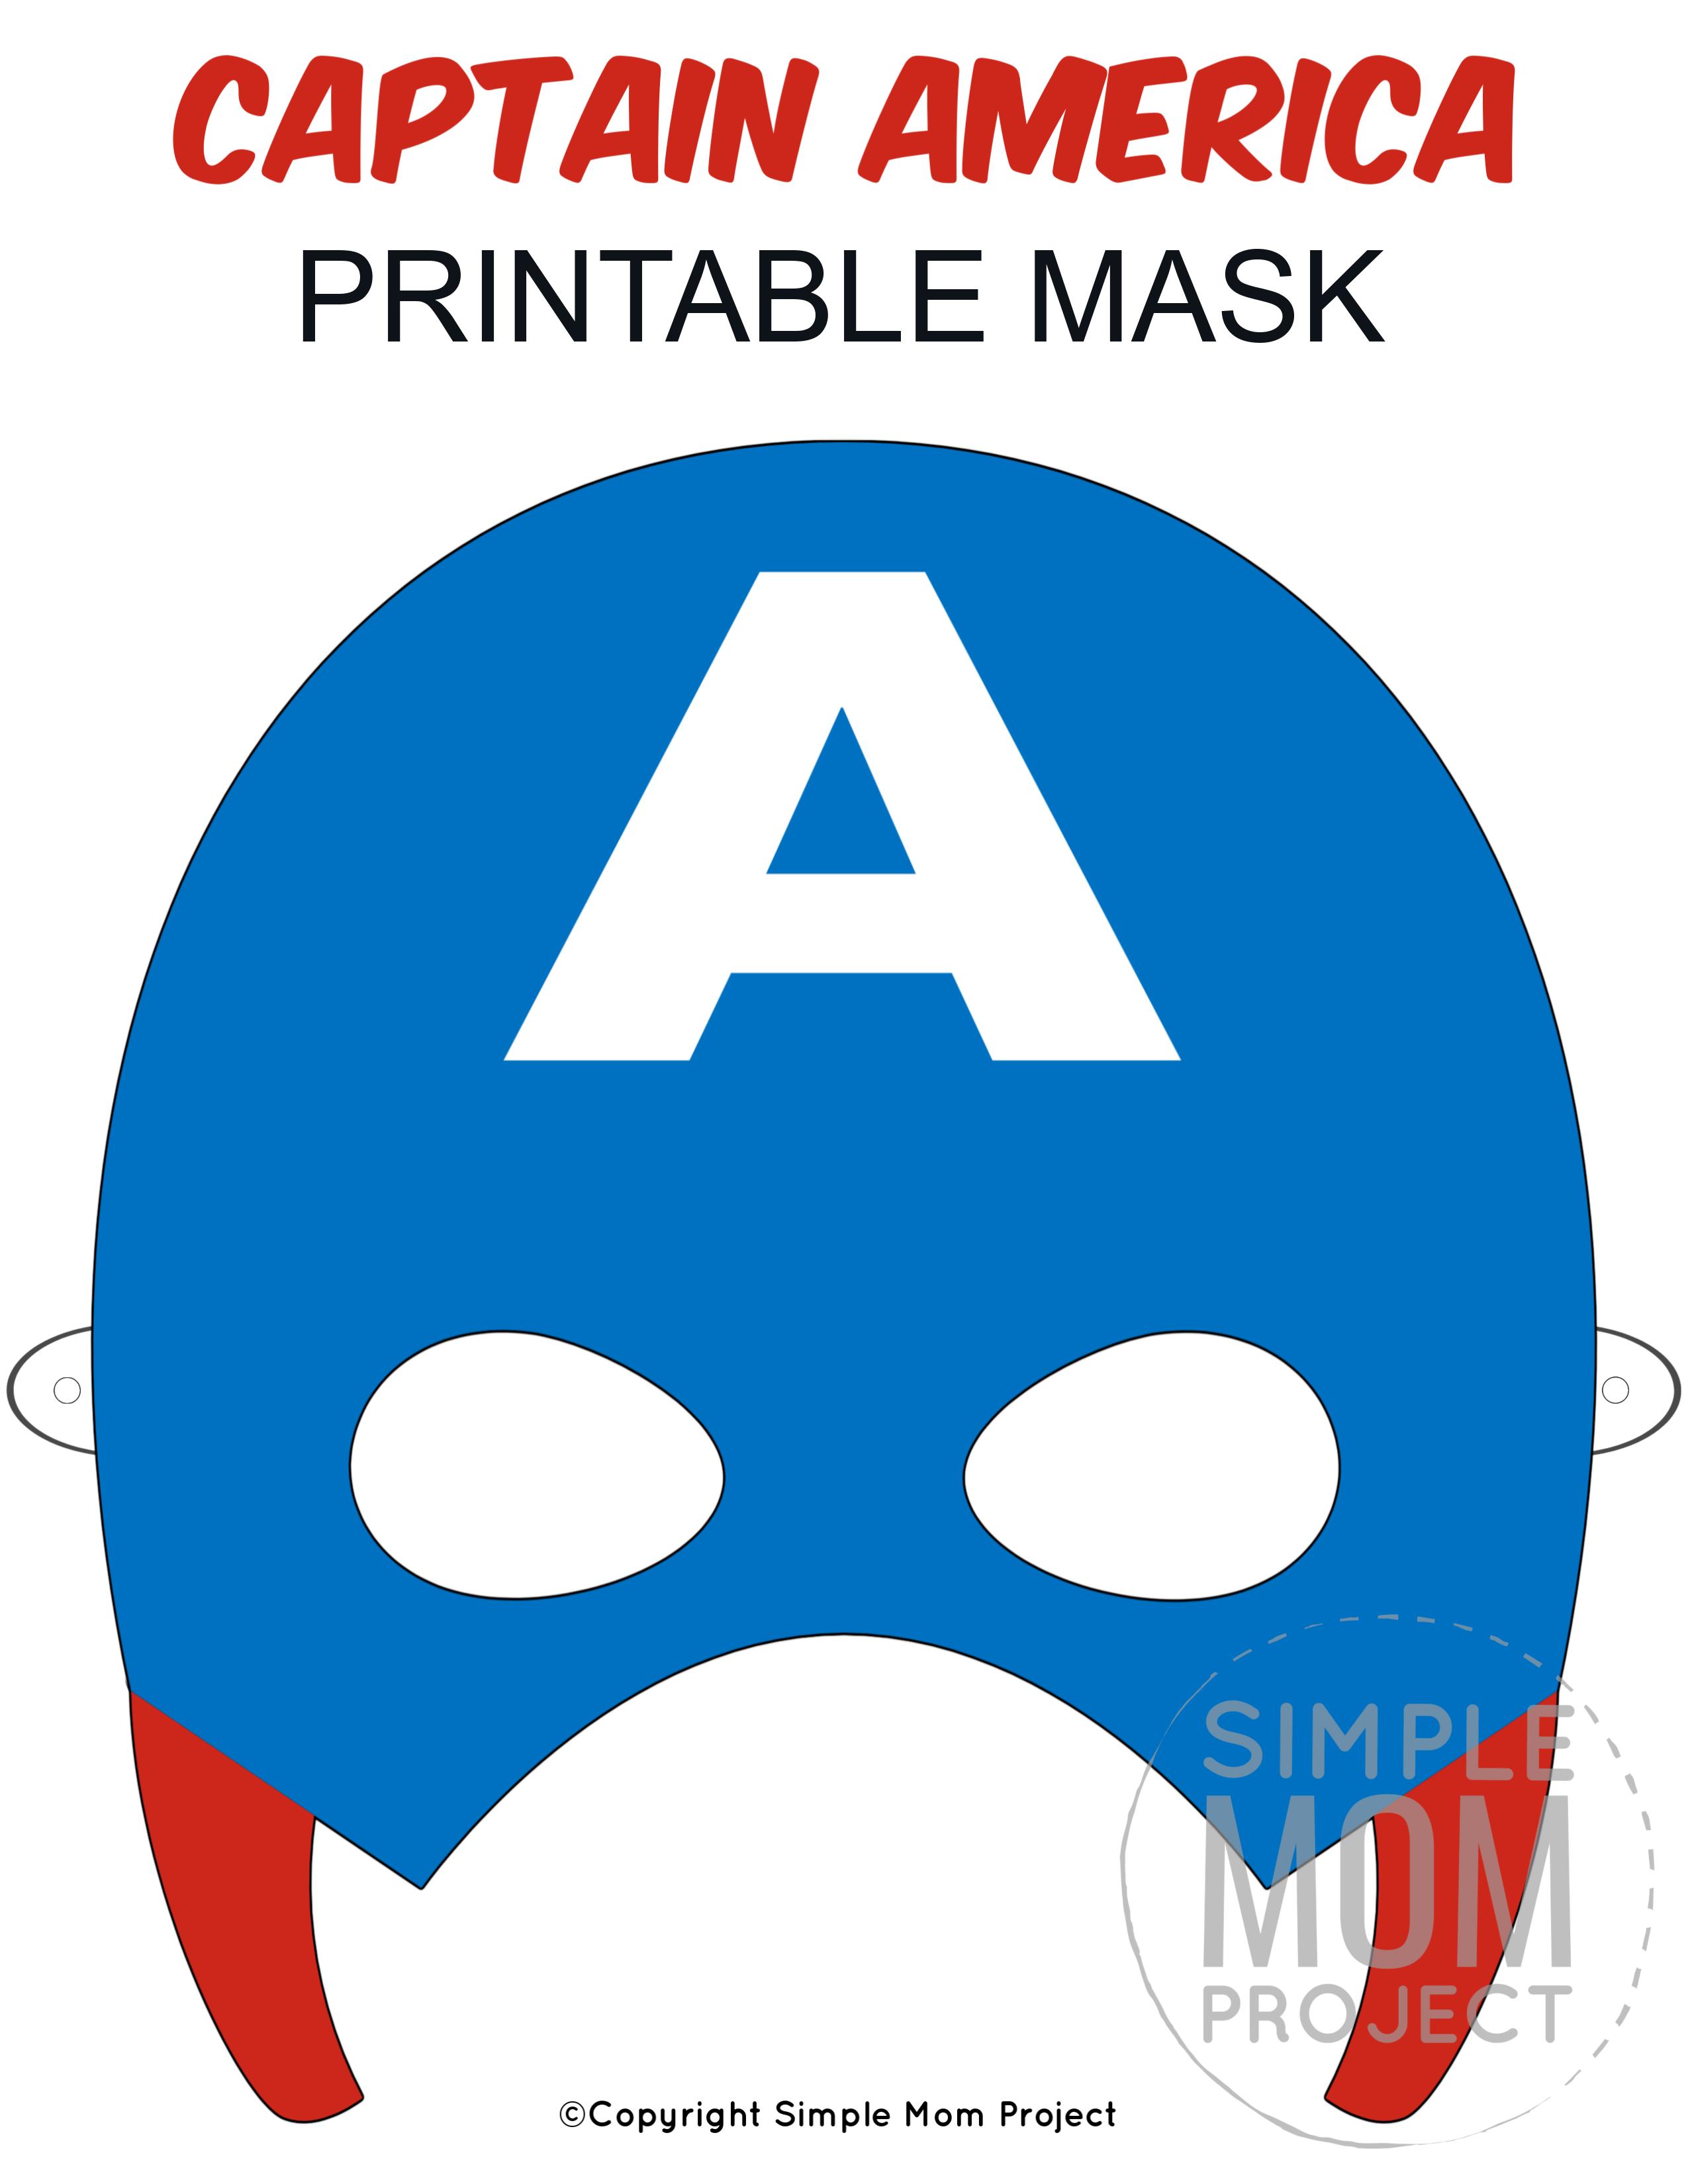 Free Printable Captain America Mask Template Captain America Mask Mask For Kids Mask Template